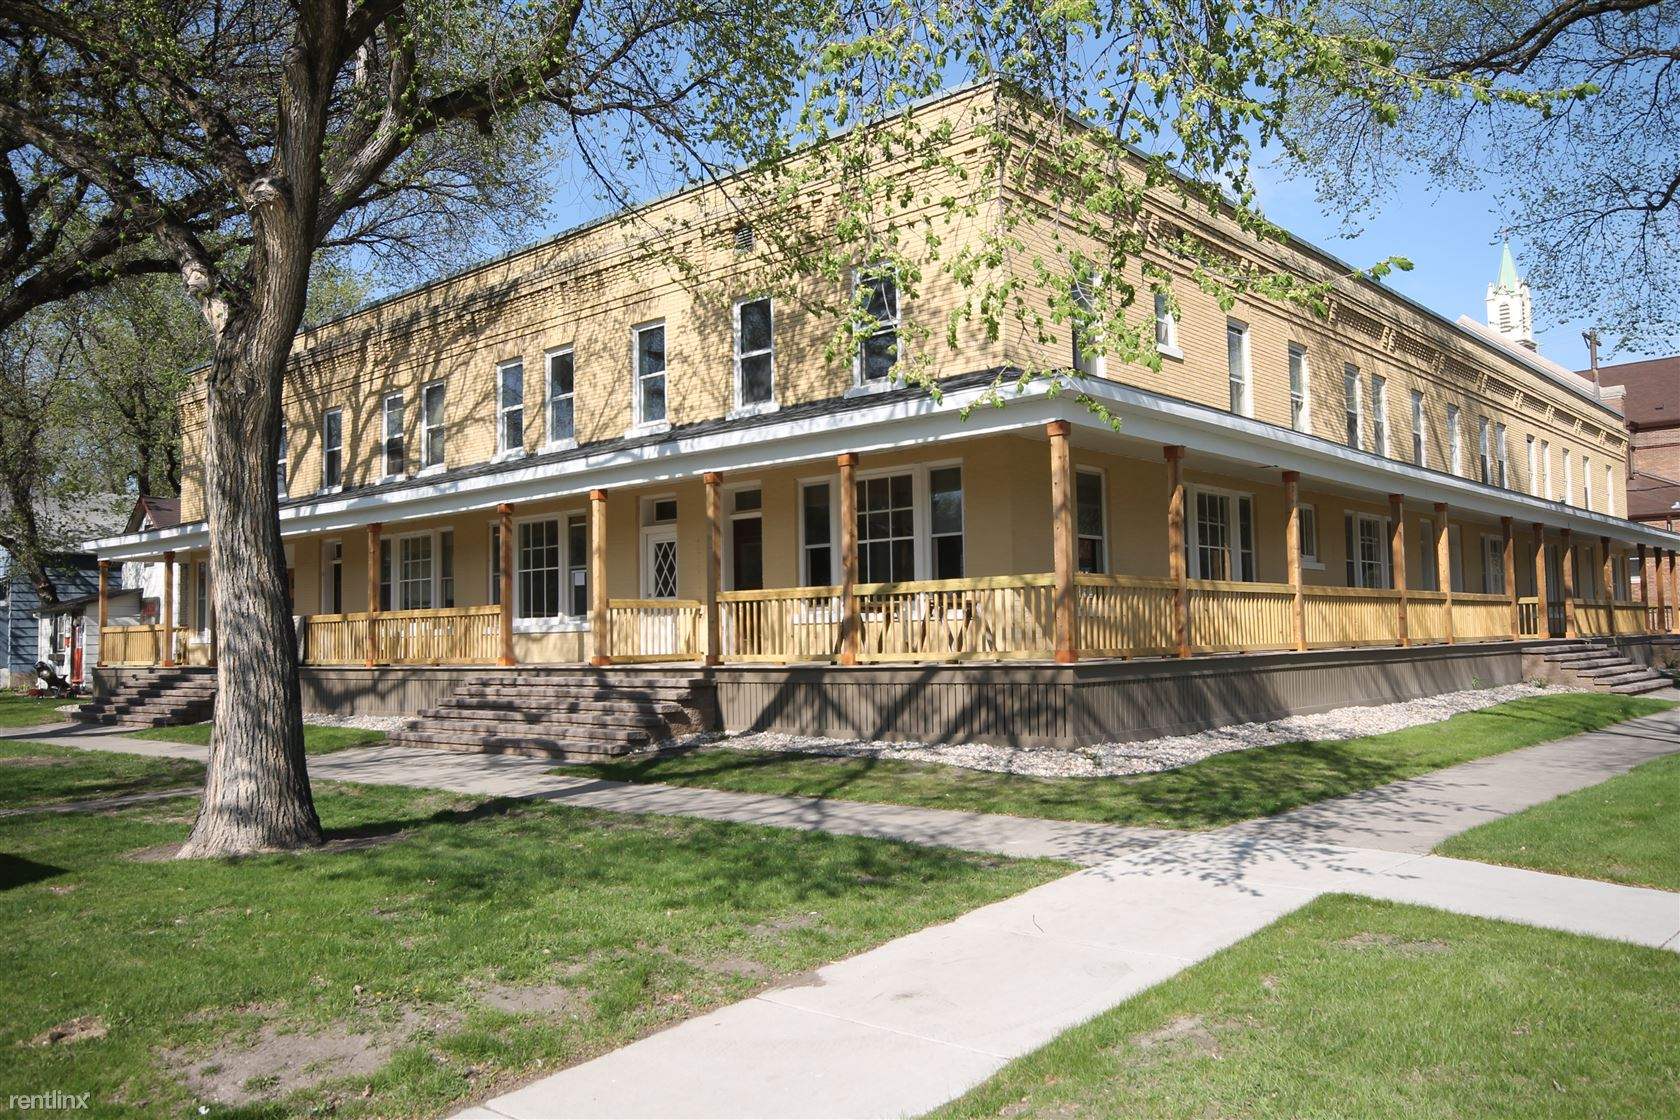 217 Chestnut St, Grand Forks, ND - $1,095